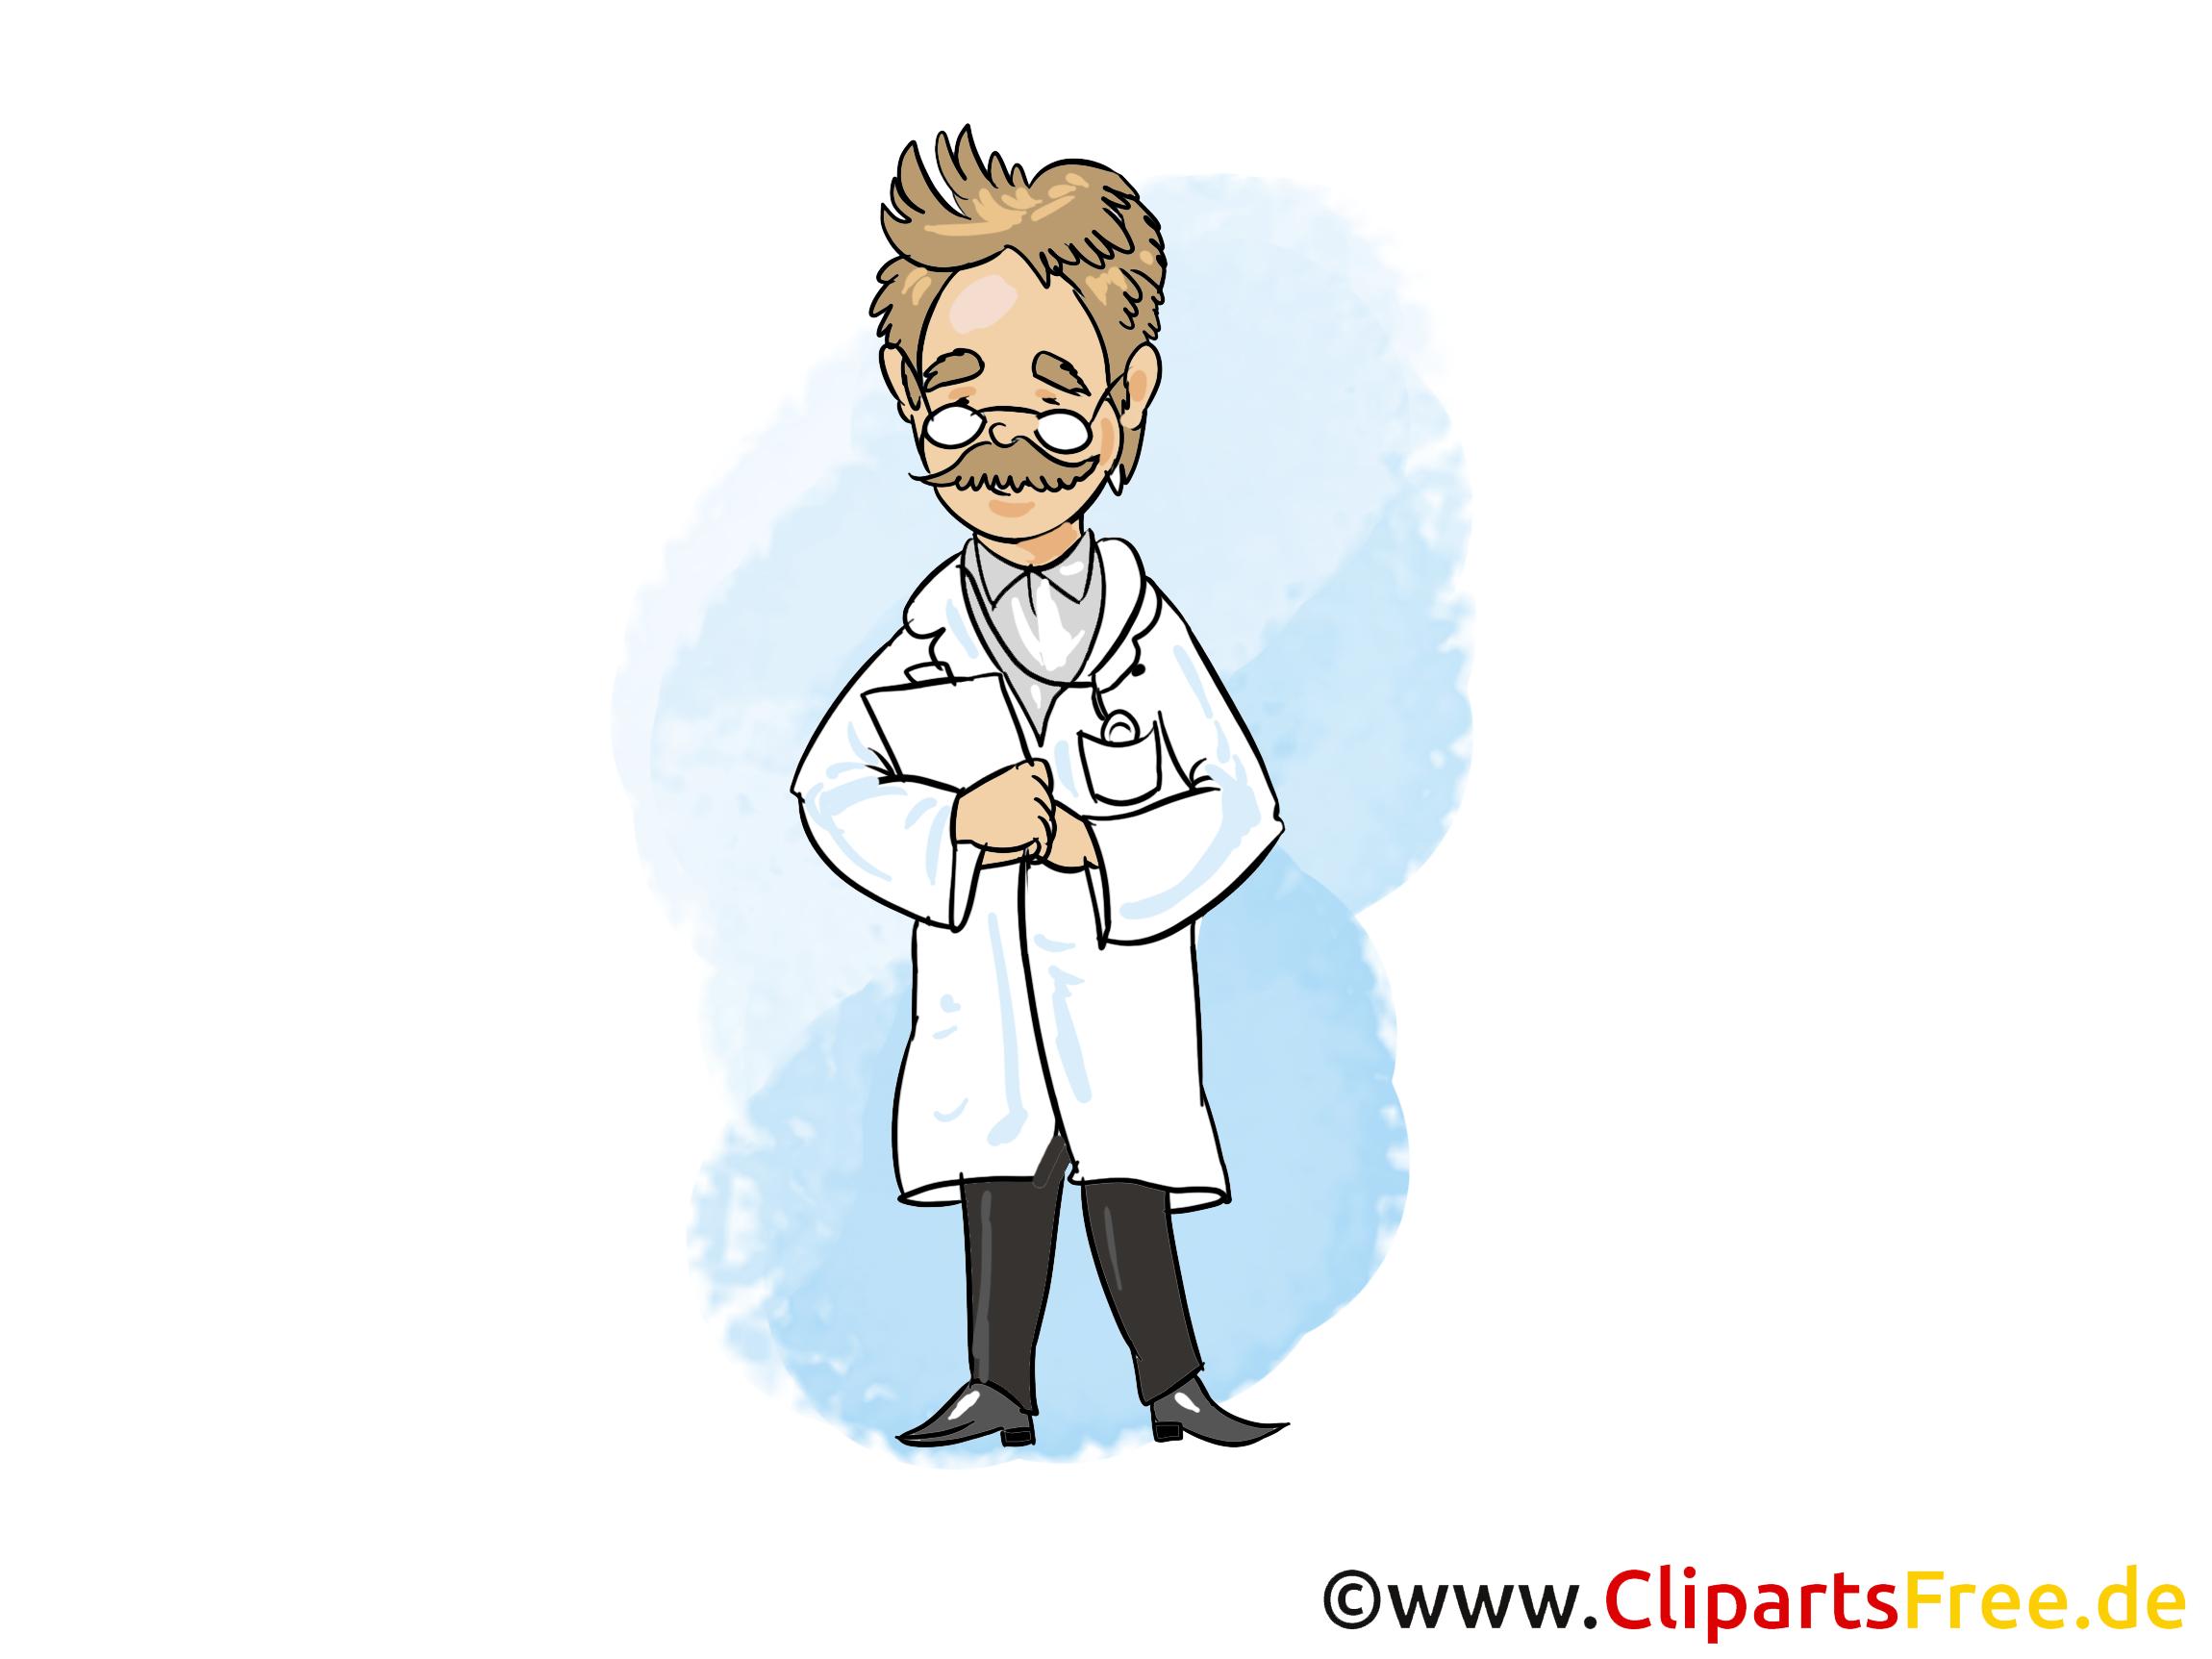 Médecin image gratuite - Médecine cliparts